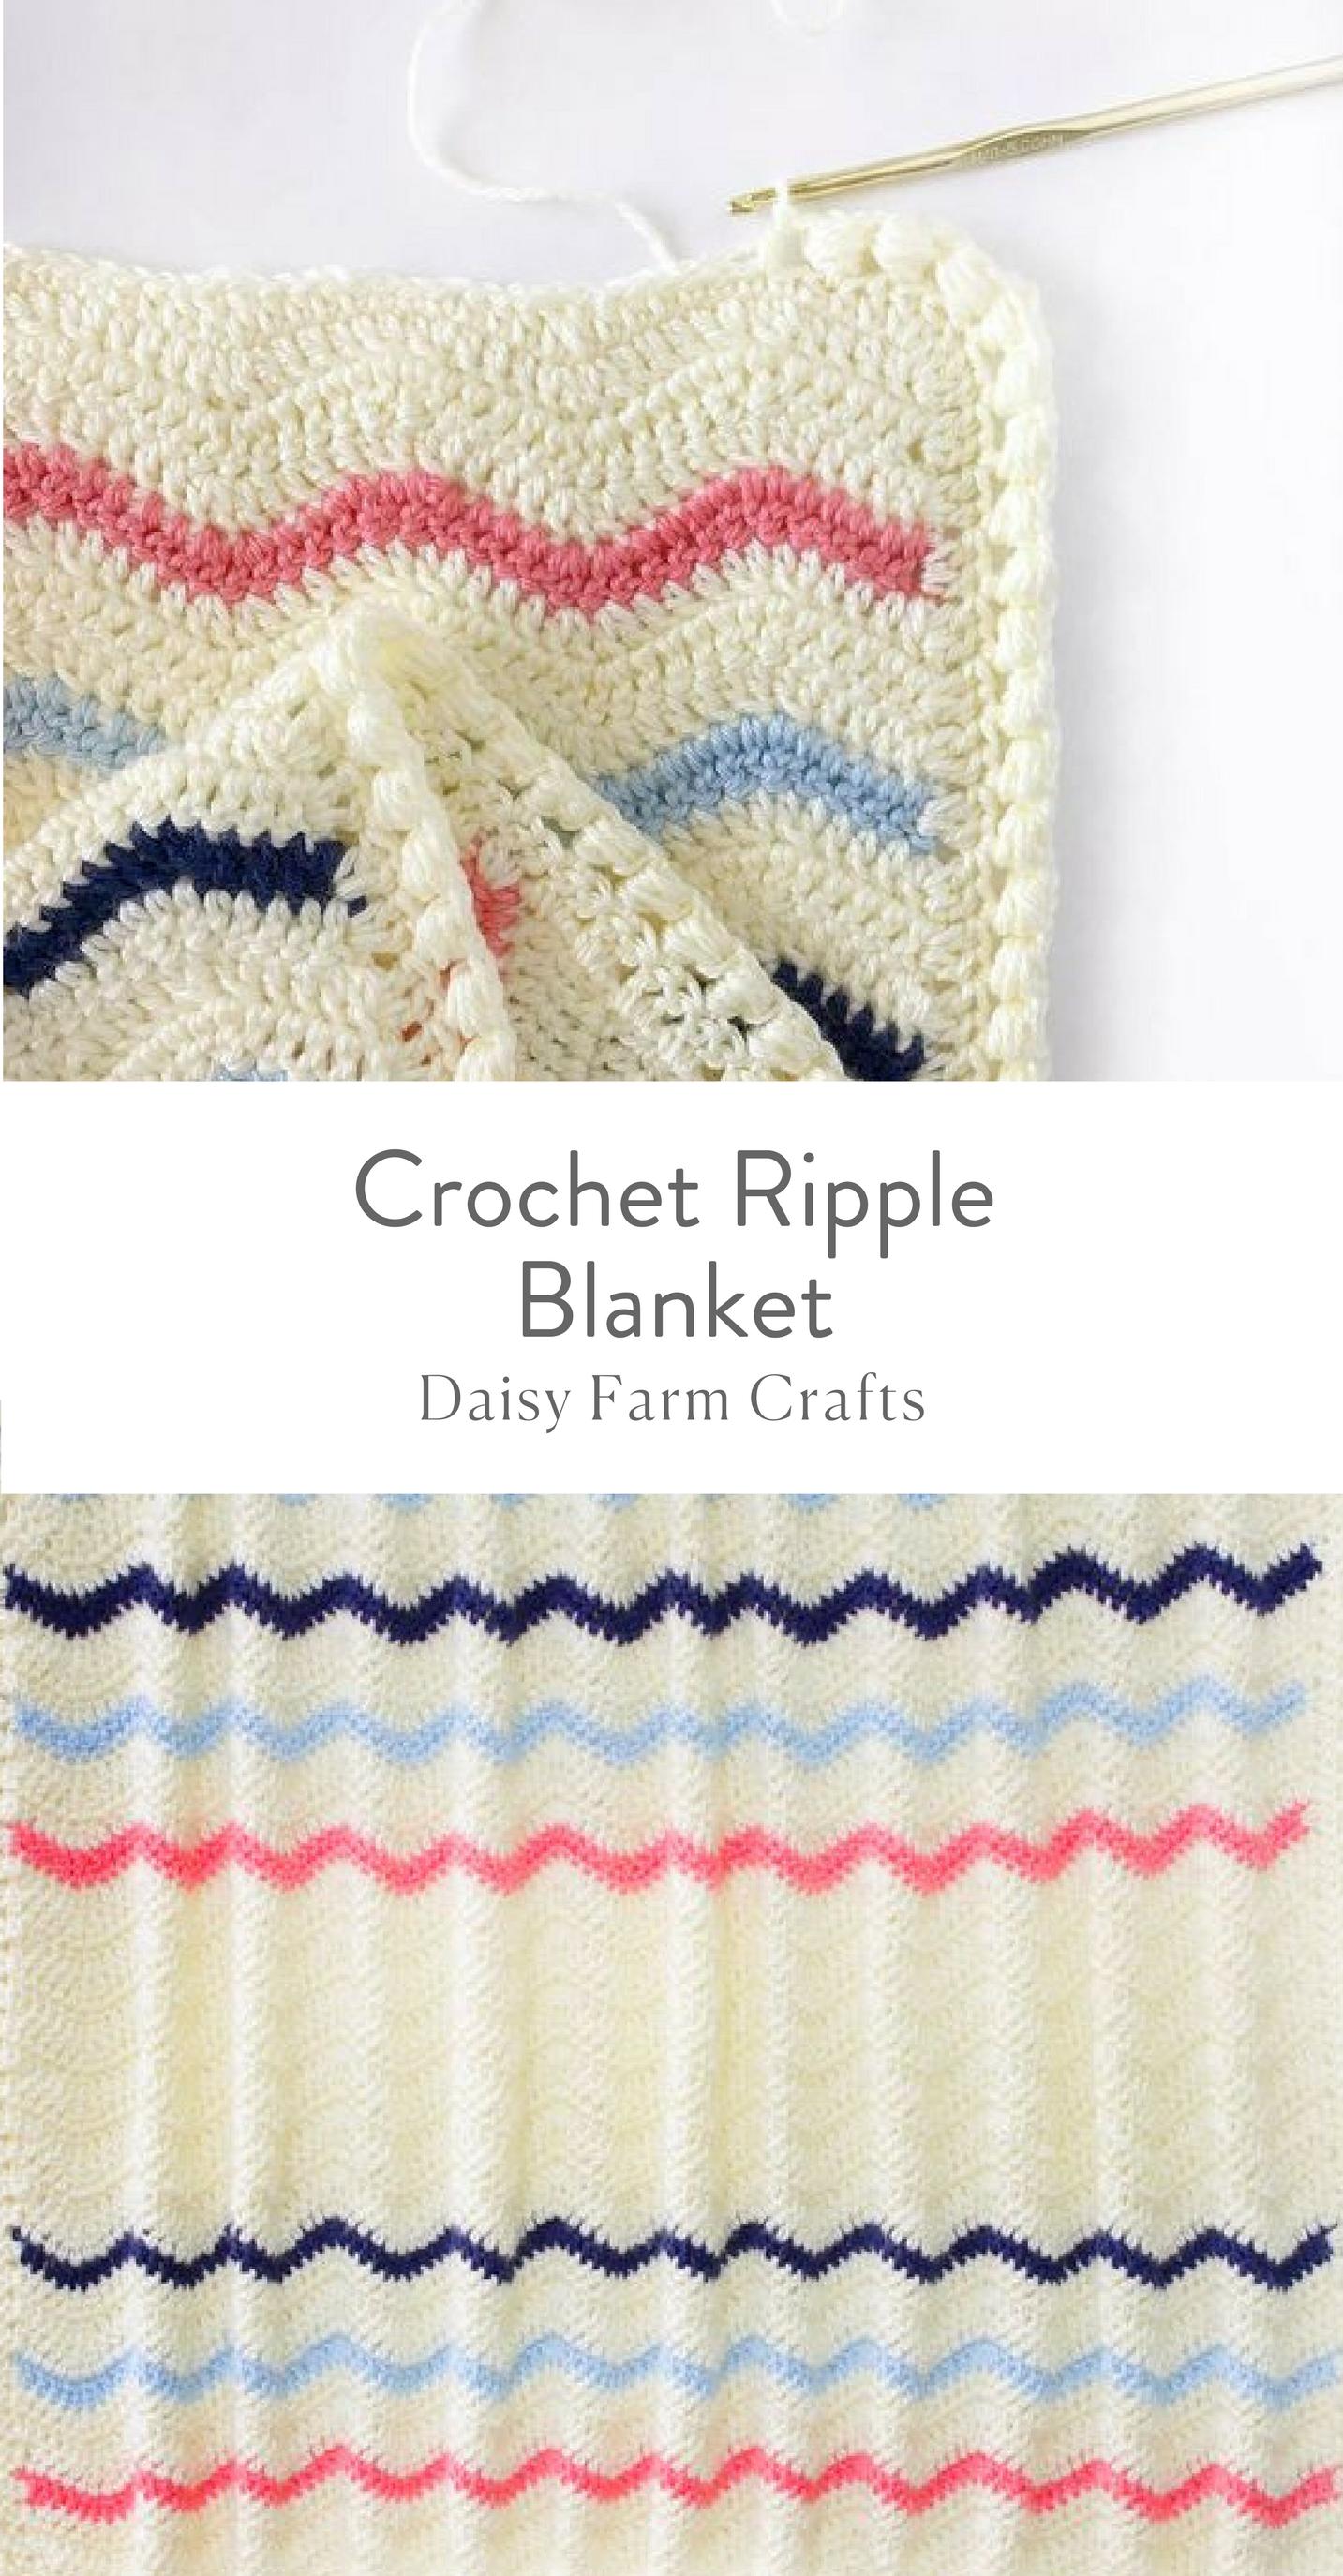 Free Pattern - Crochet Ripple Blanket   Crochet   Pinterest ...